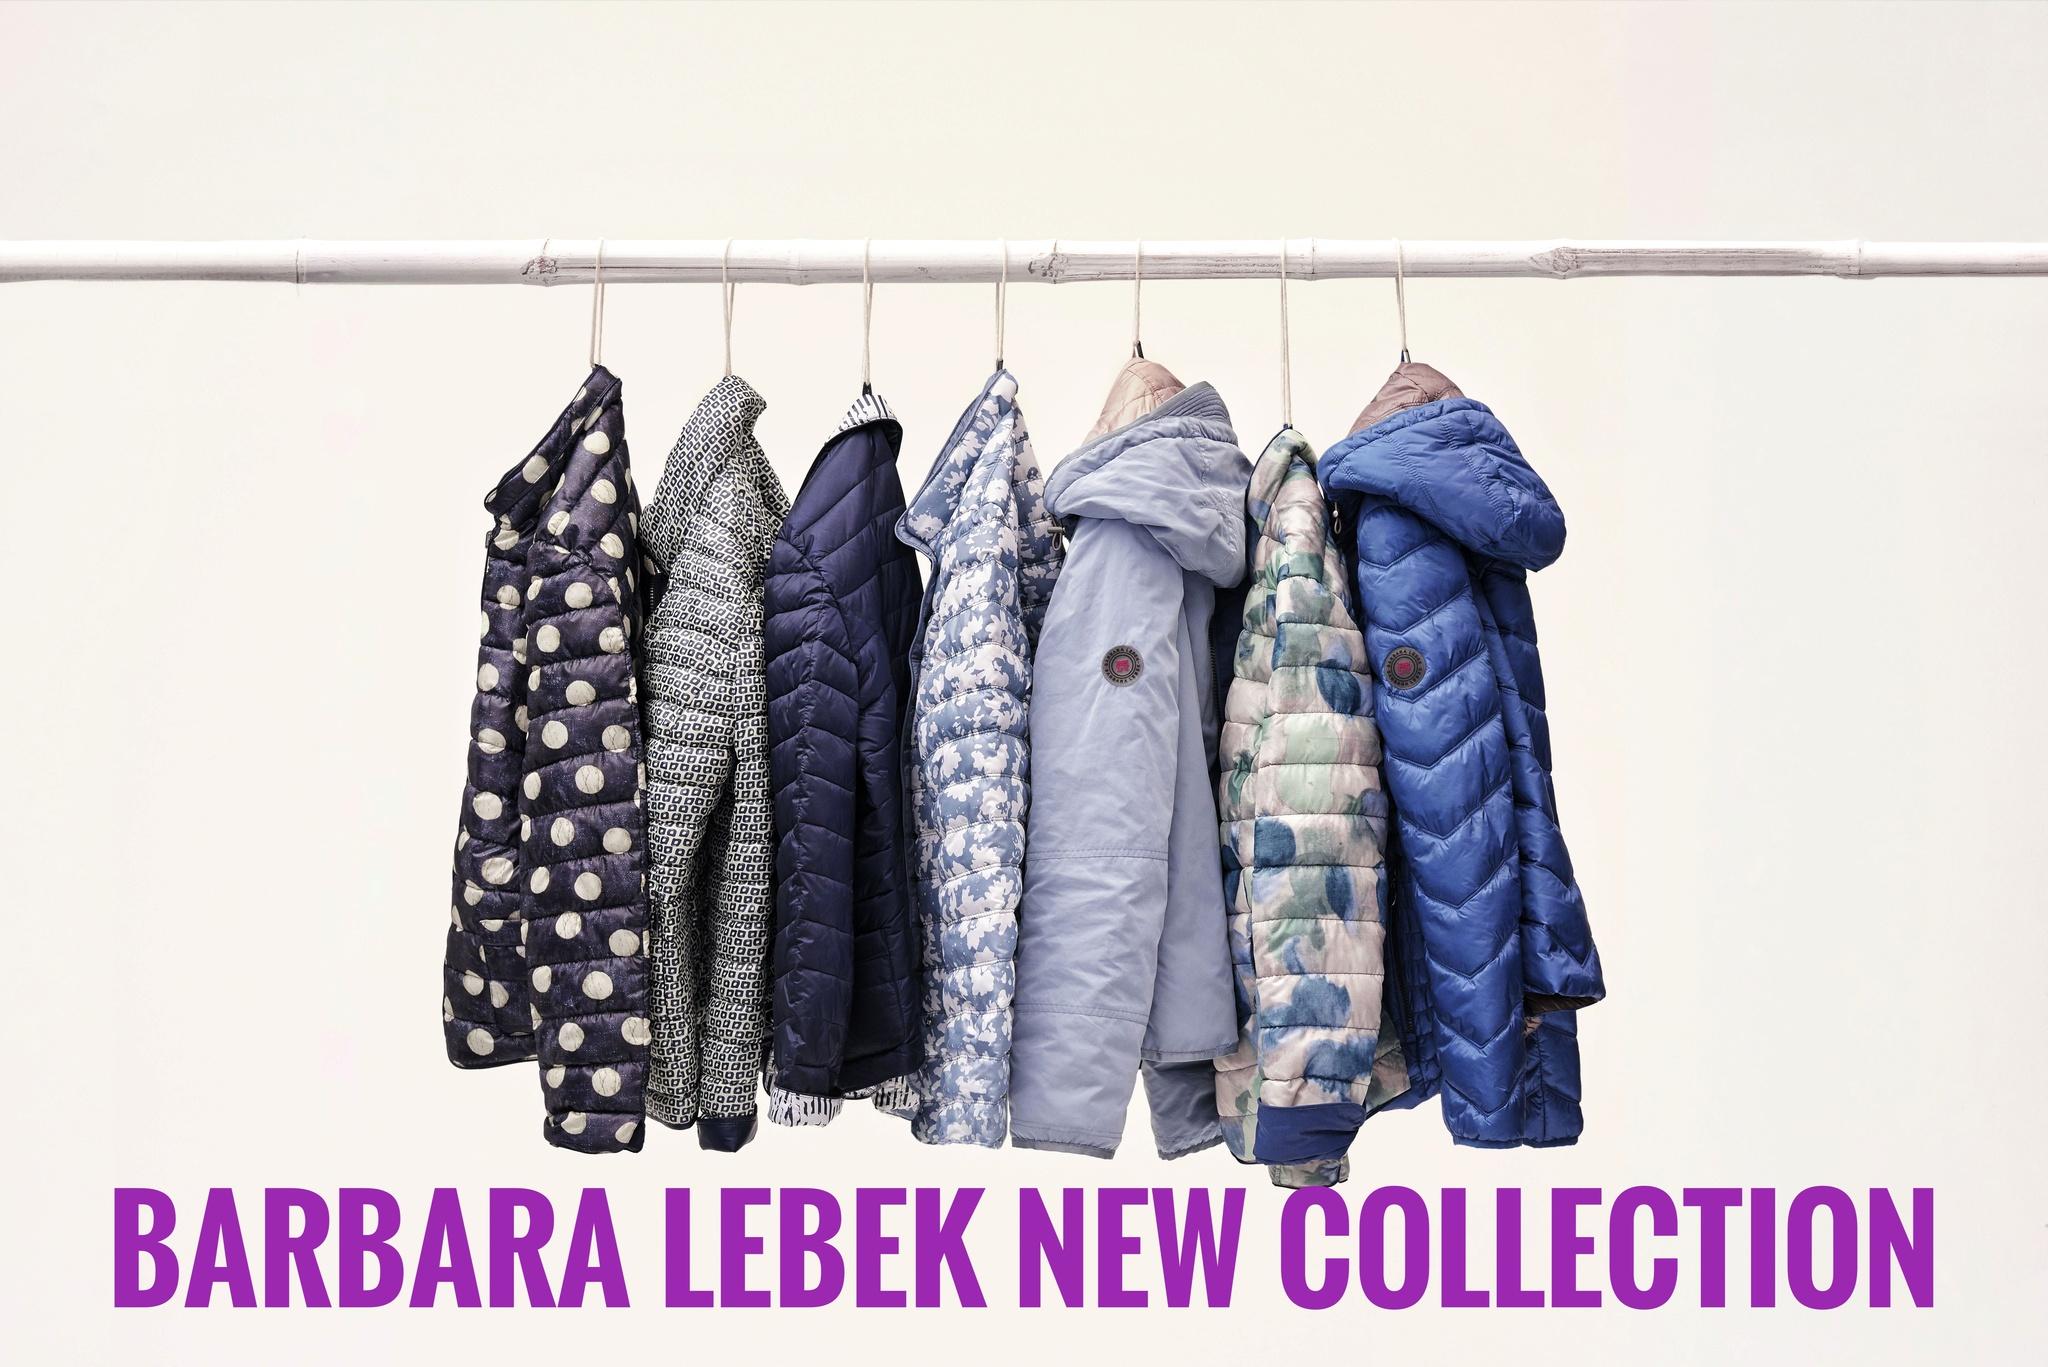 Новая коллекция Barbara Lebek весна 2018.